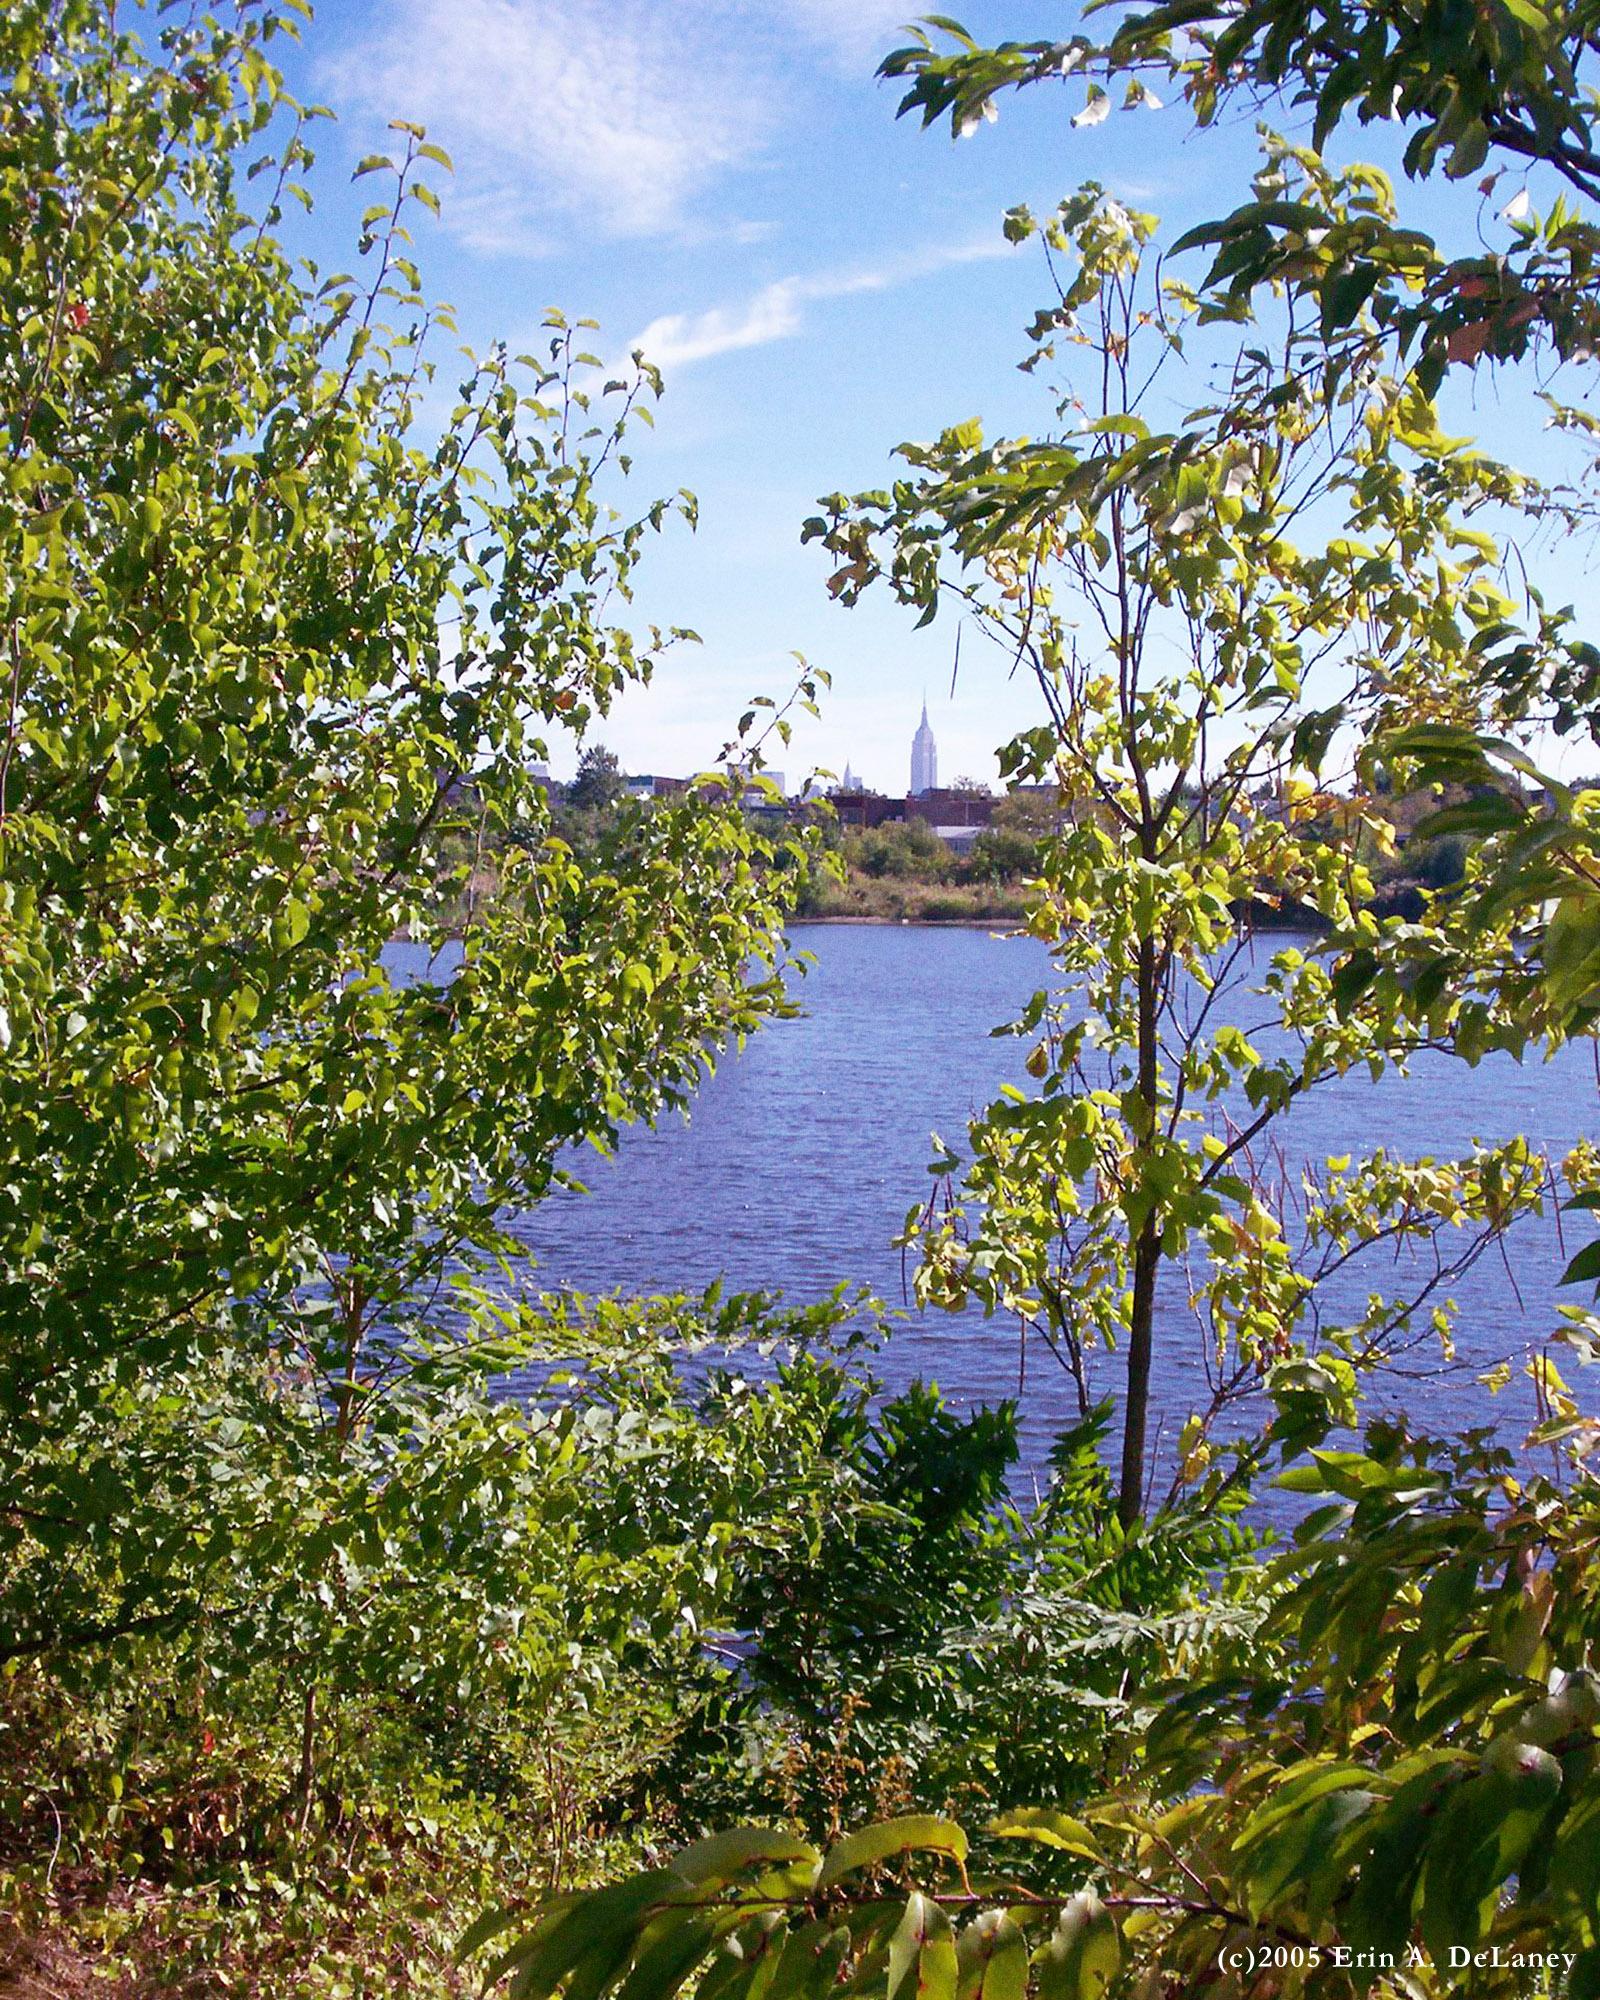 Views at the JC Reservoir, 2005